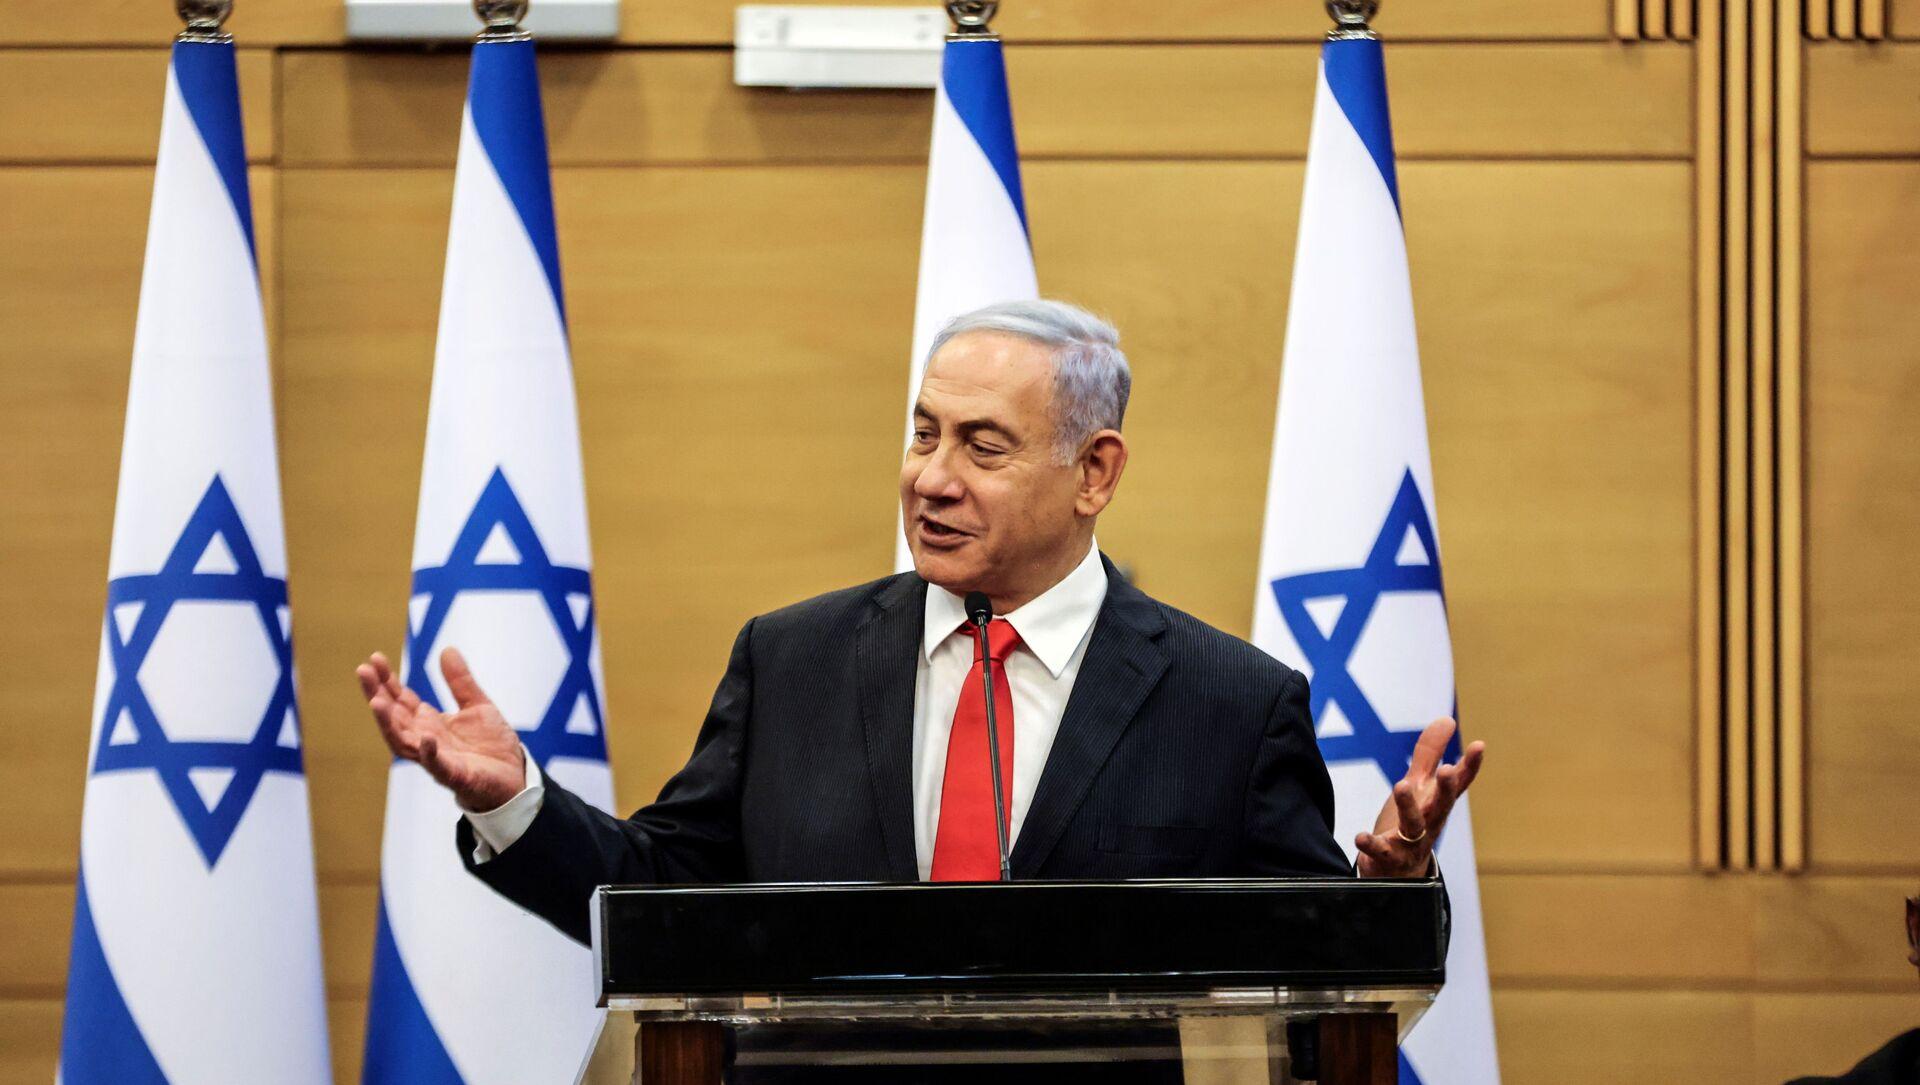 Leader of Israeli Opposition Benjamin Netanyahu speaks during a meeting with his Likud party in the Knesset, the Israeli parliament, in Jerusalem June 14, 2021.  - Sputnik International, 1920, 03.08.2021